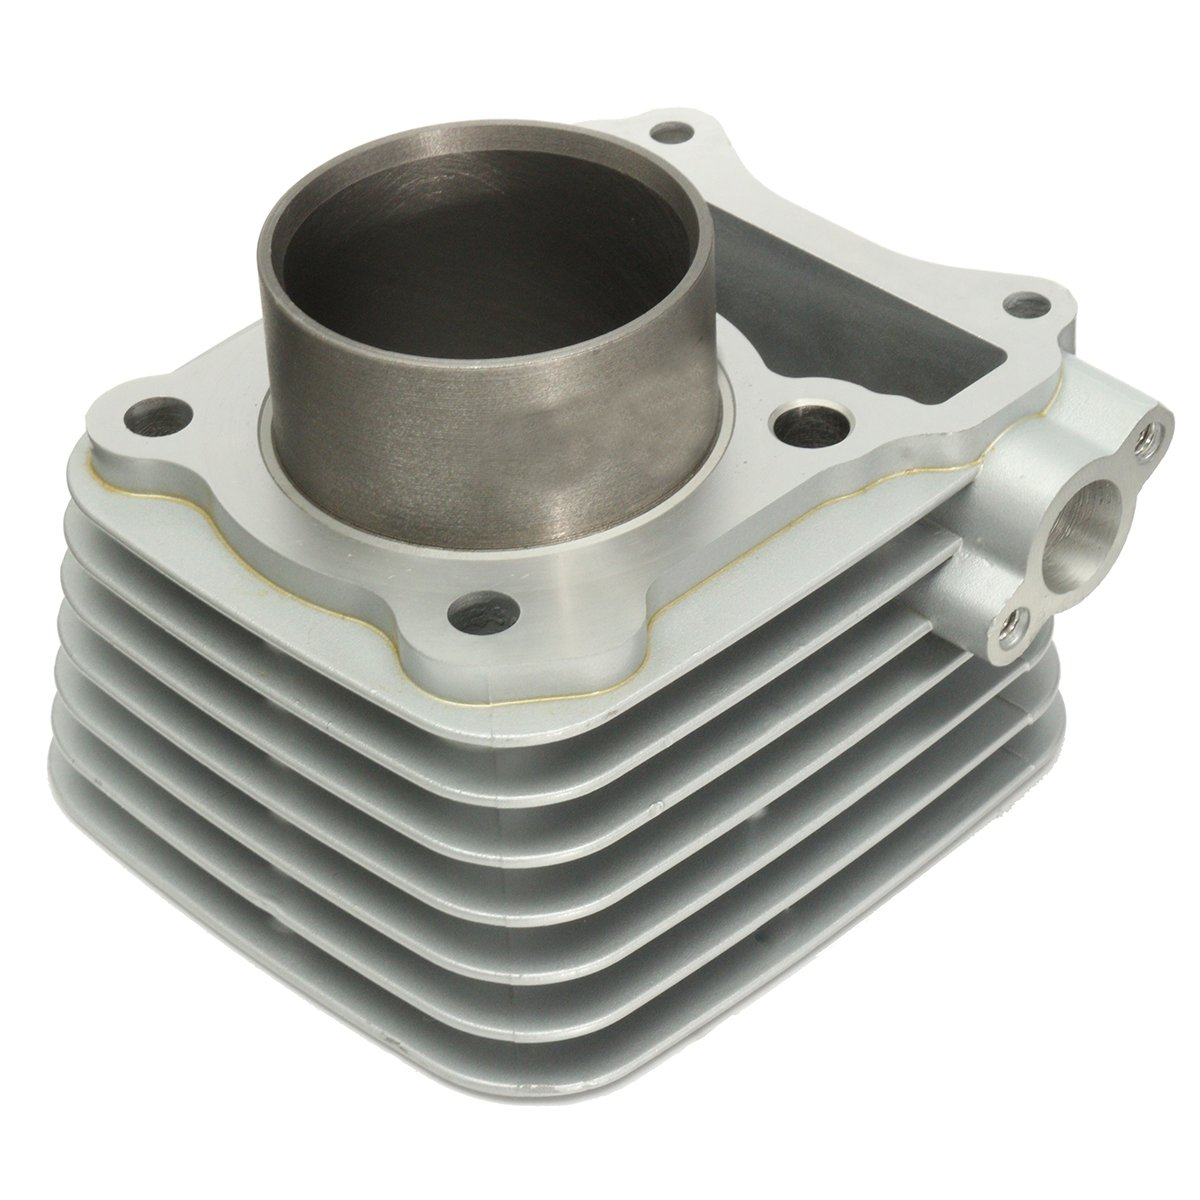 New Oil Pump for Suzuki GN 125 GN125 GZ125 GS125 DR125